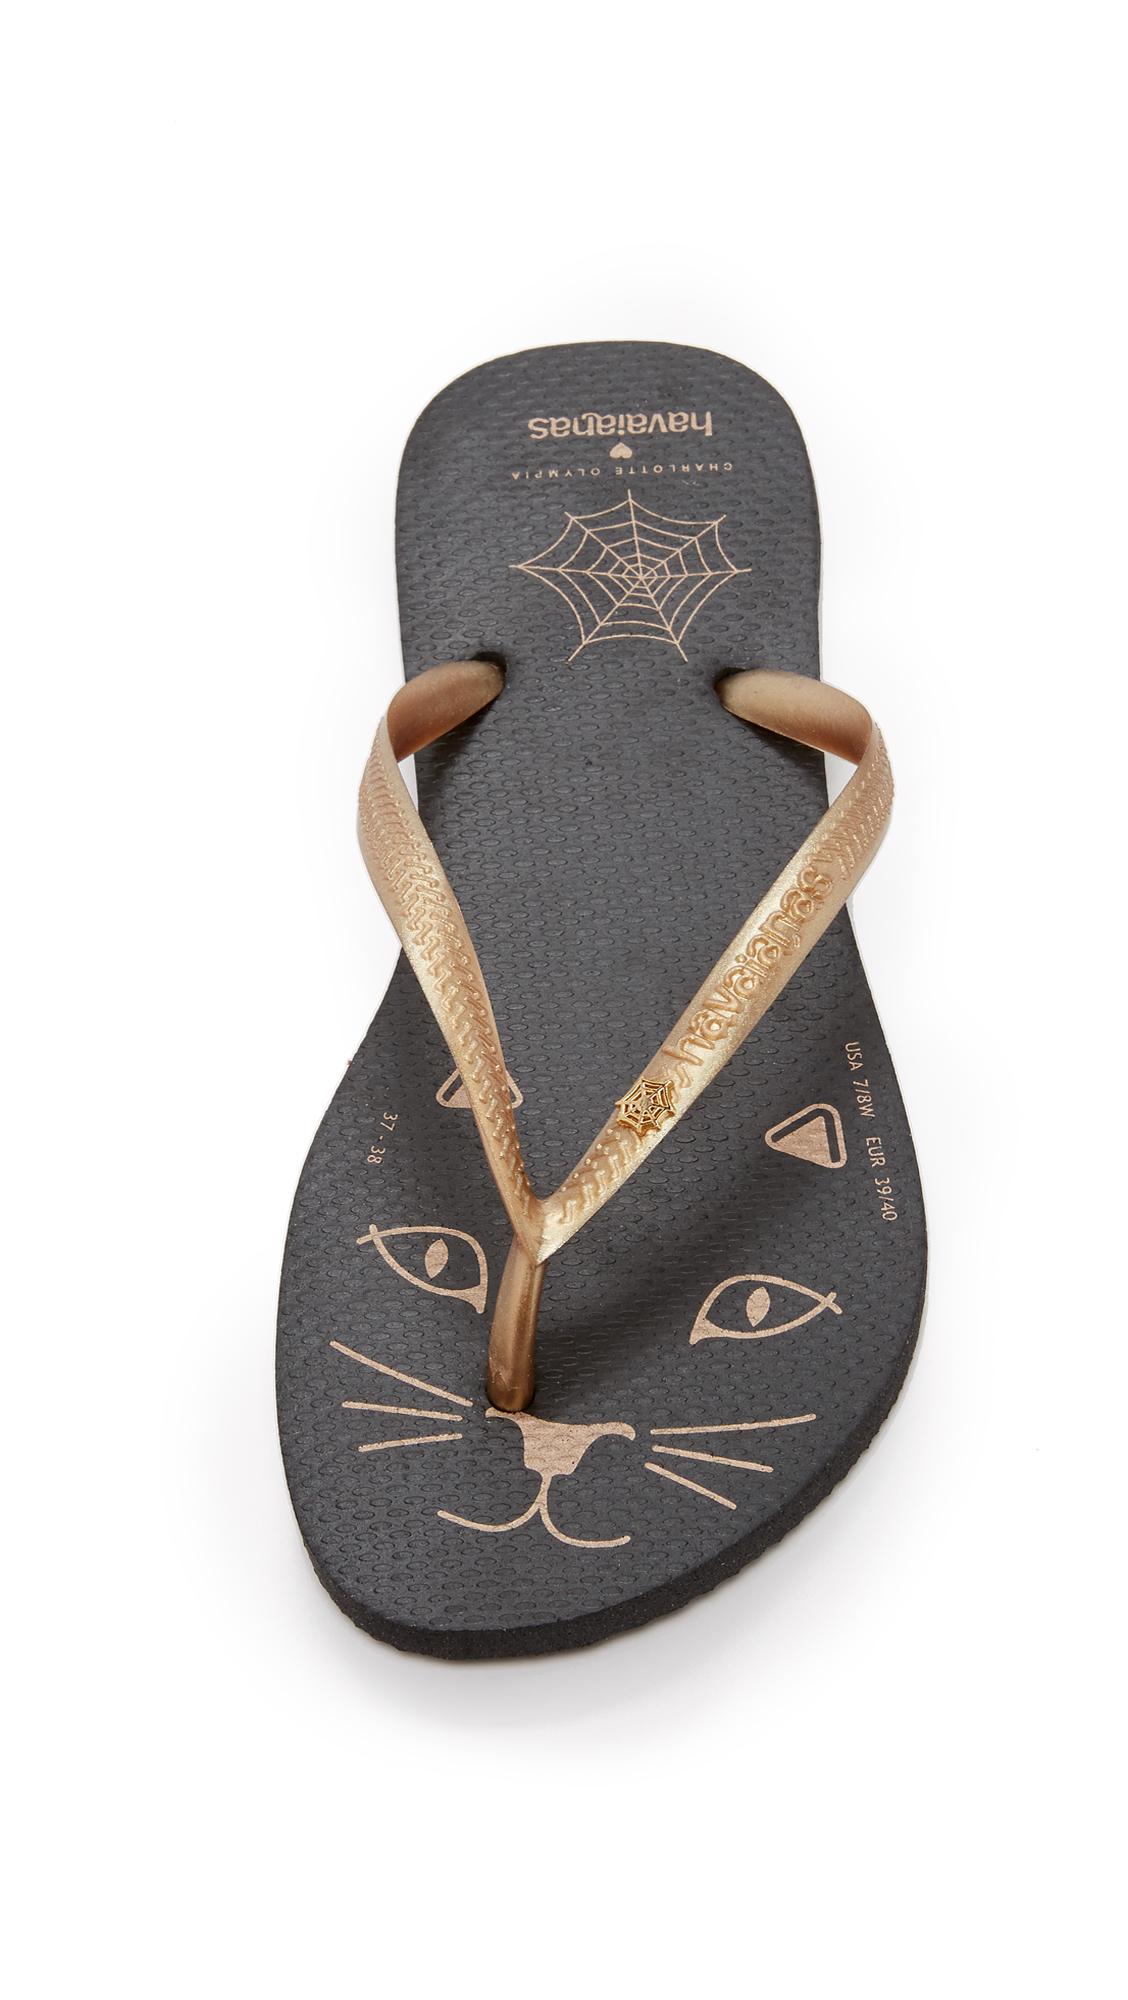 9b399e59ffe Charlotte Olympia Kitty Havaianas Flip Flops